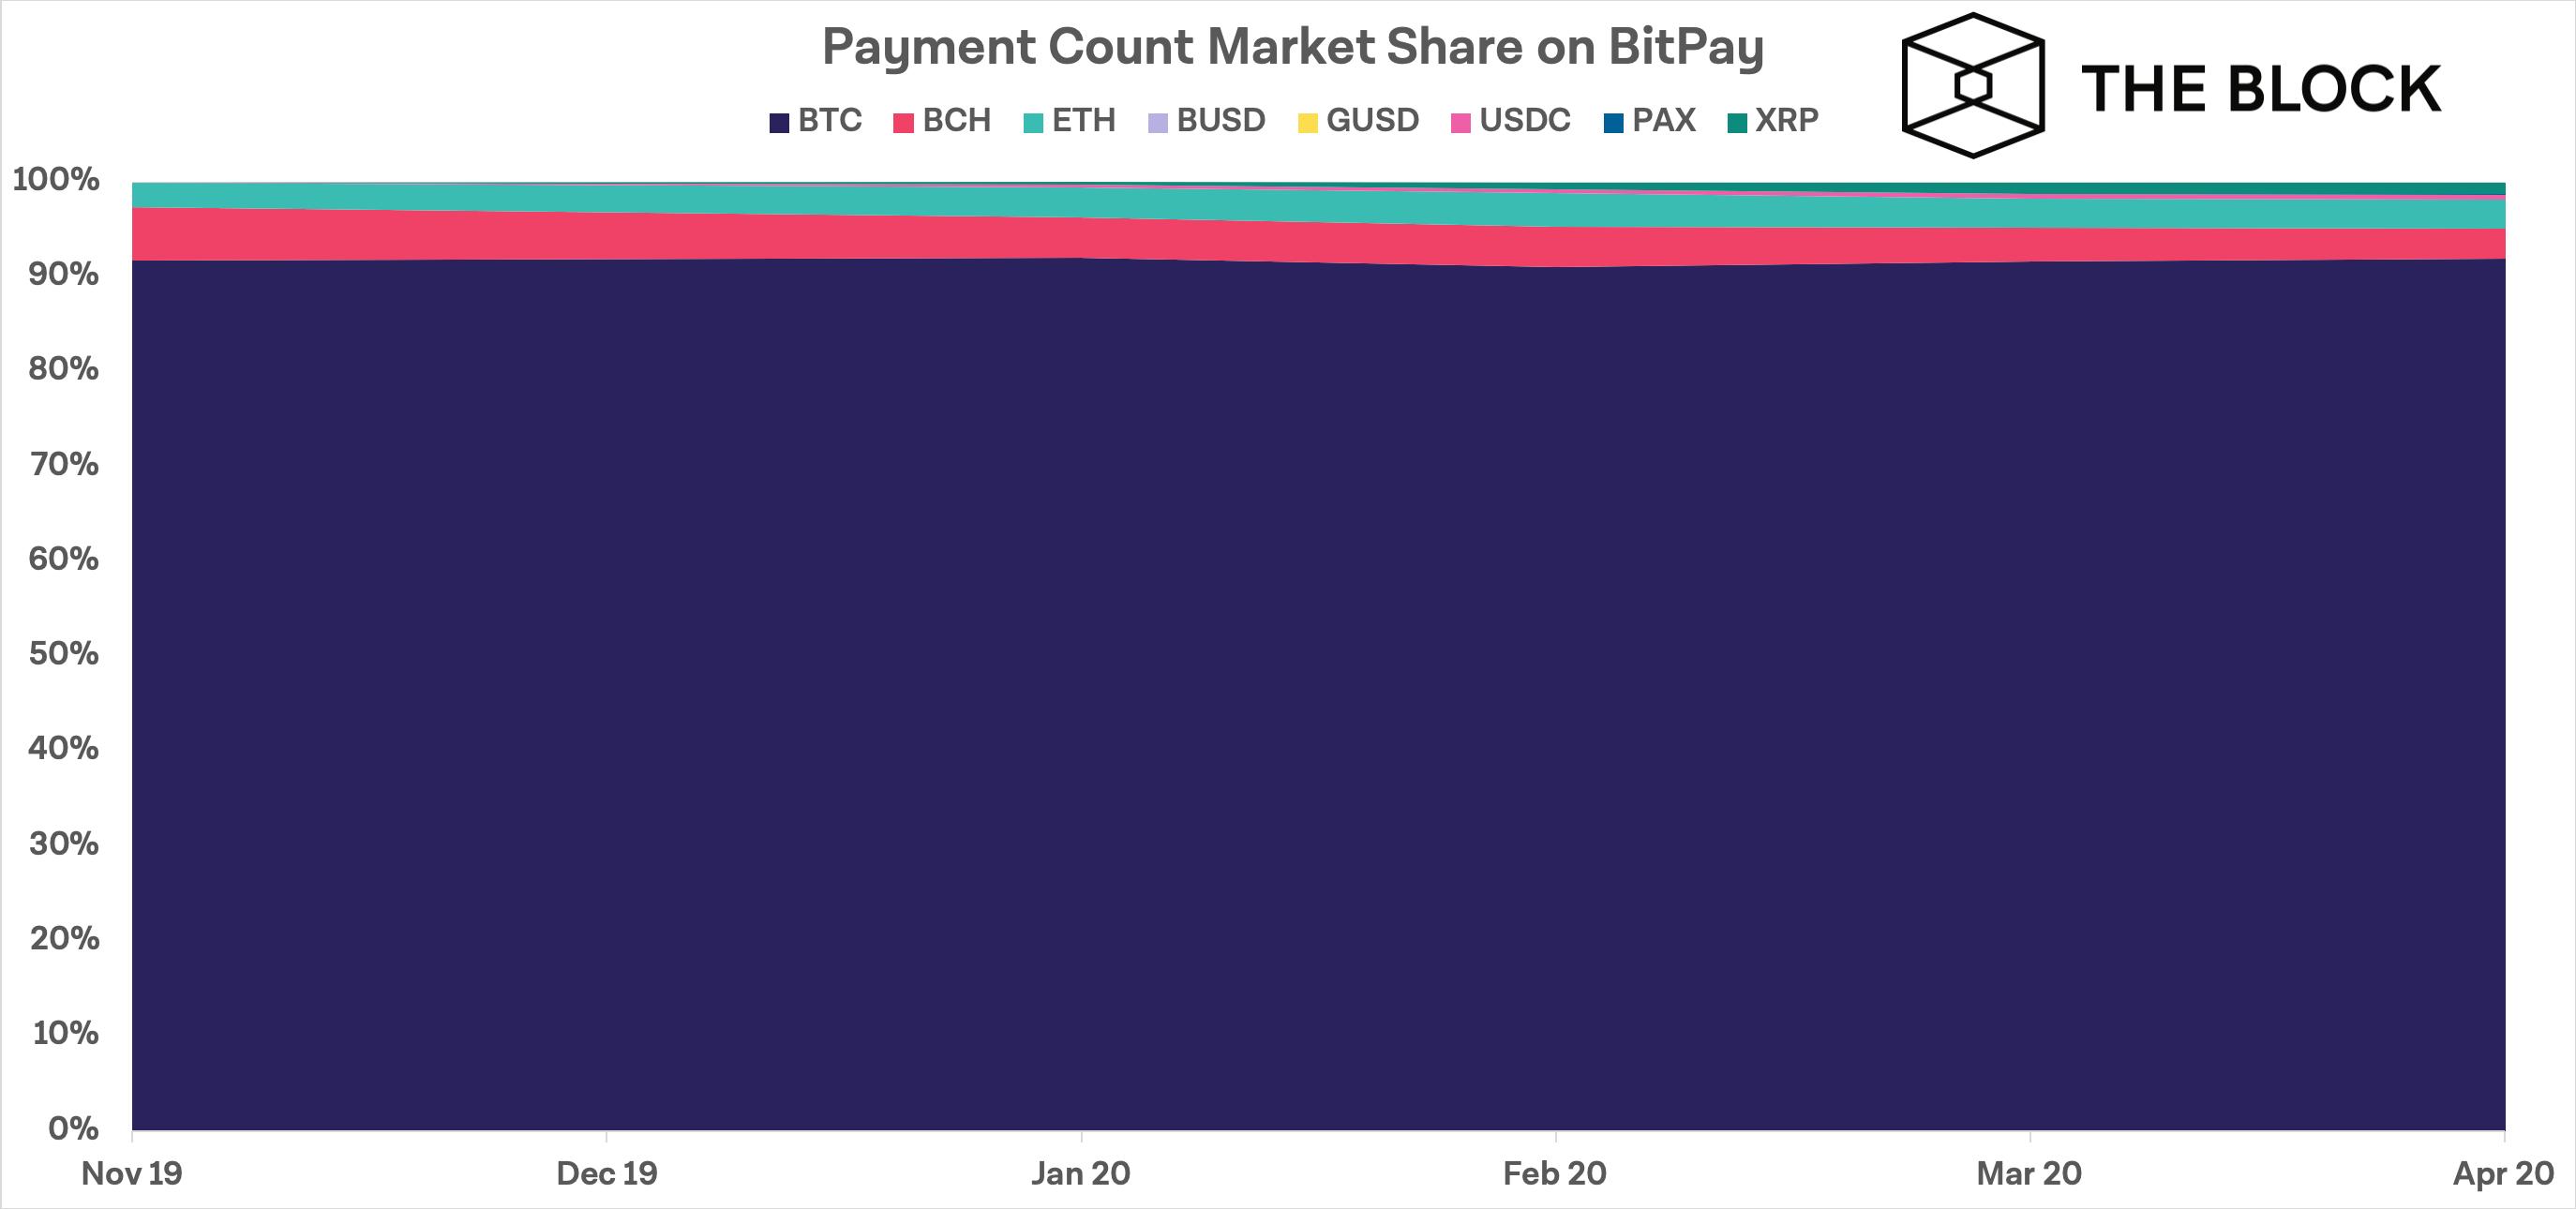 Bitcoin занимает свыше 90% транзакций BitPay